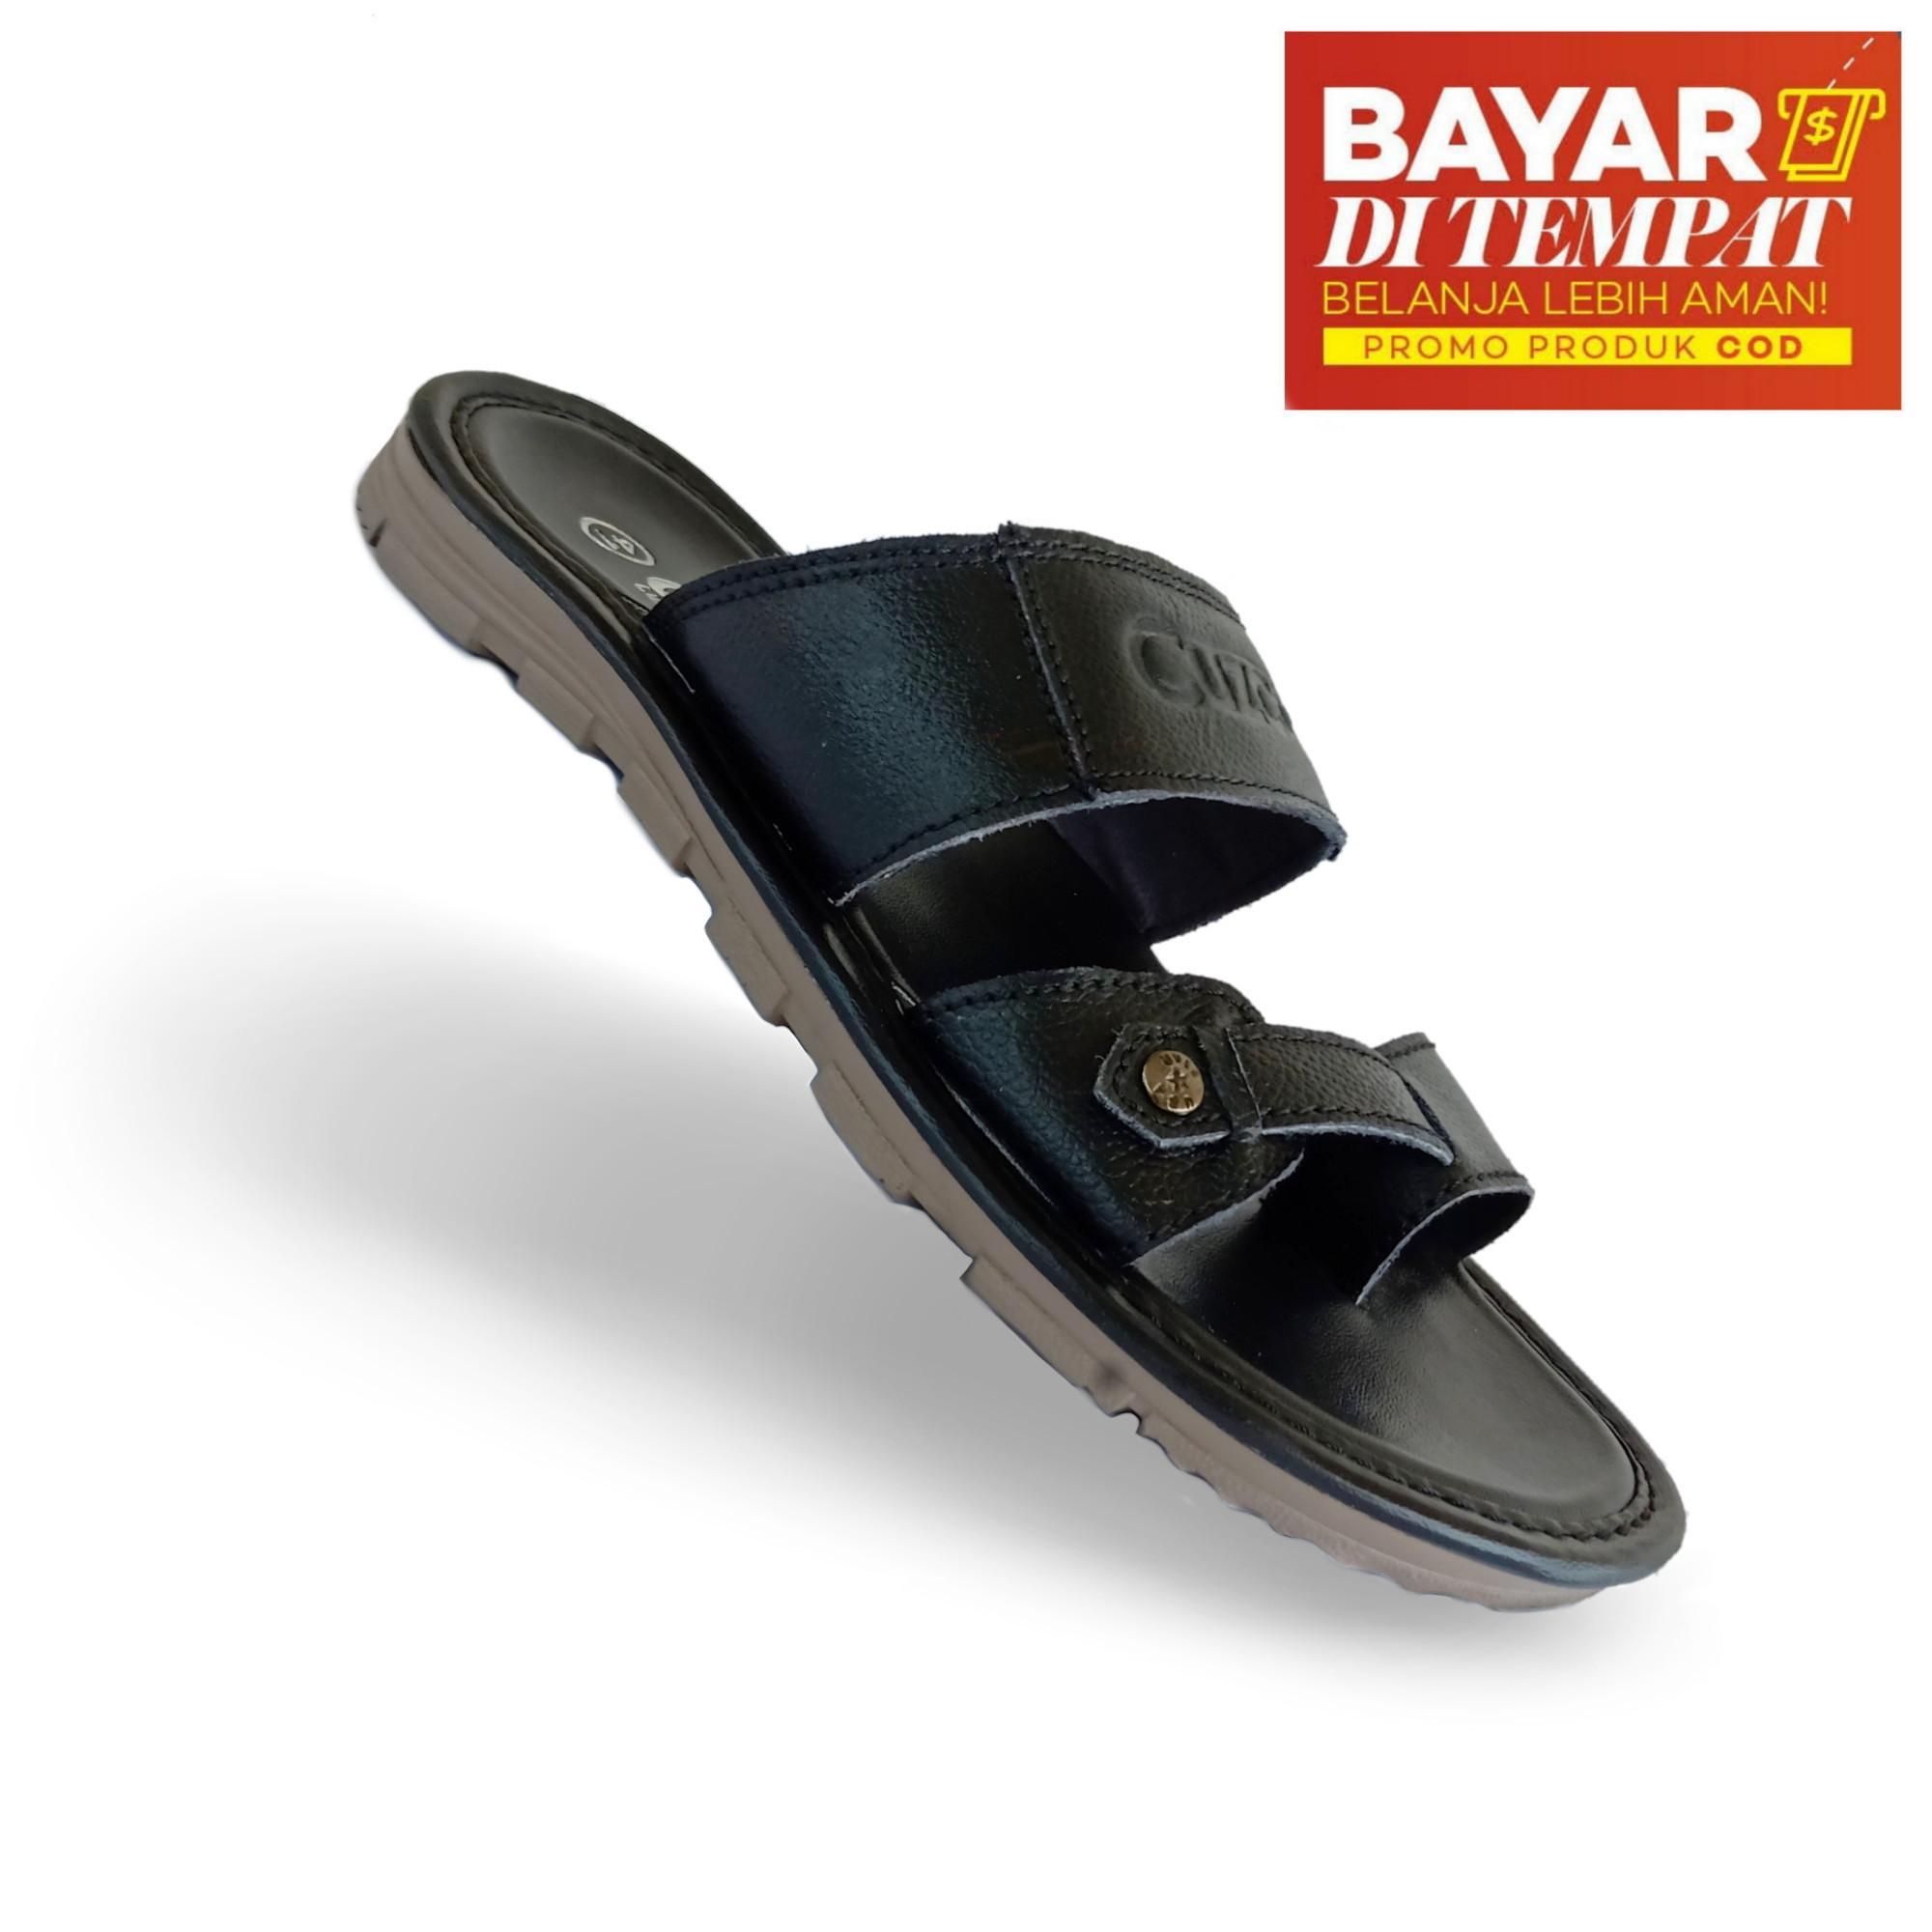 Sandal Kulit Pria - Sandal Pria Kulit - Wiro s - Cuzco 7f9ccc7fbd